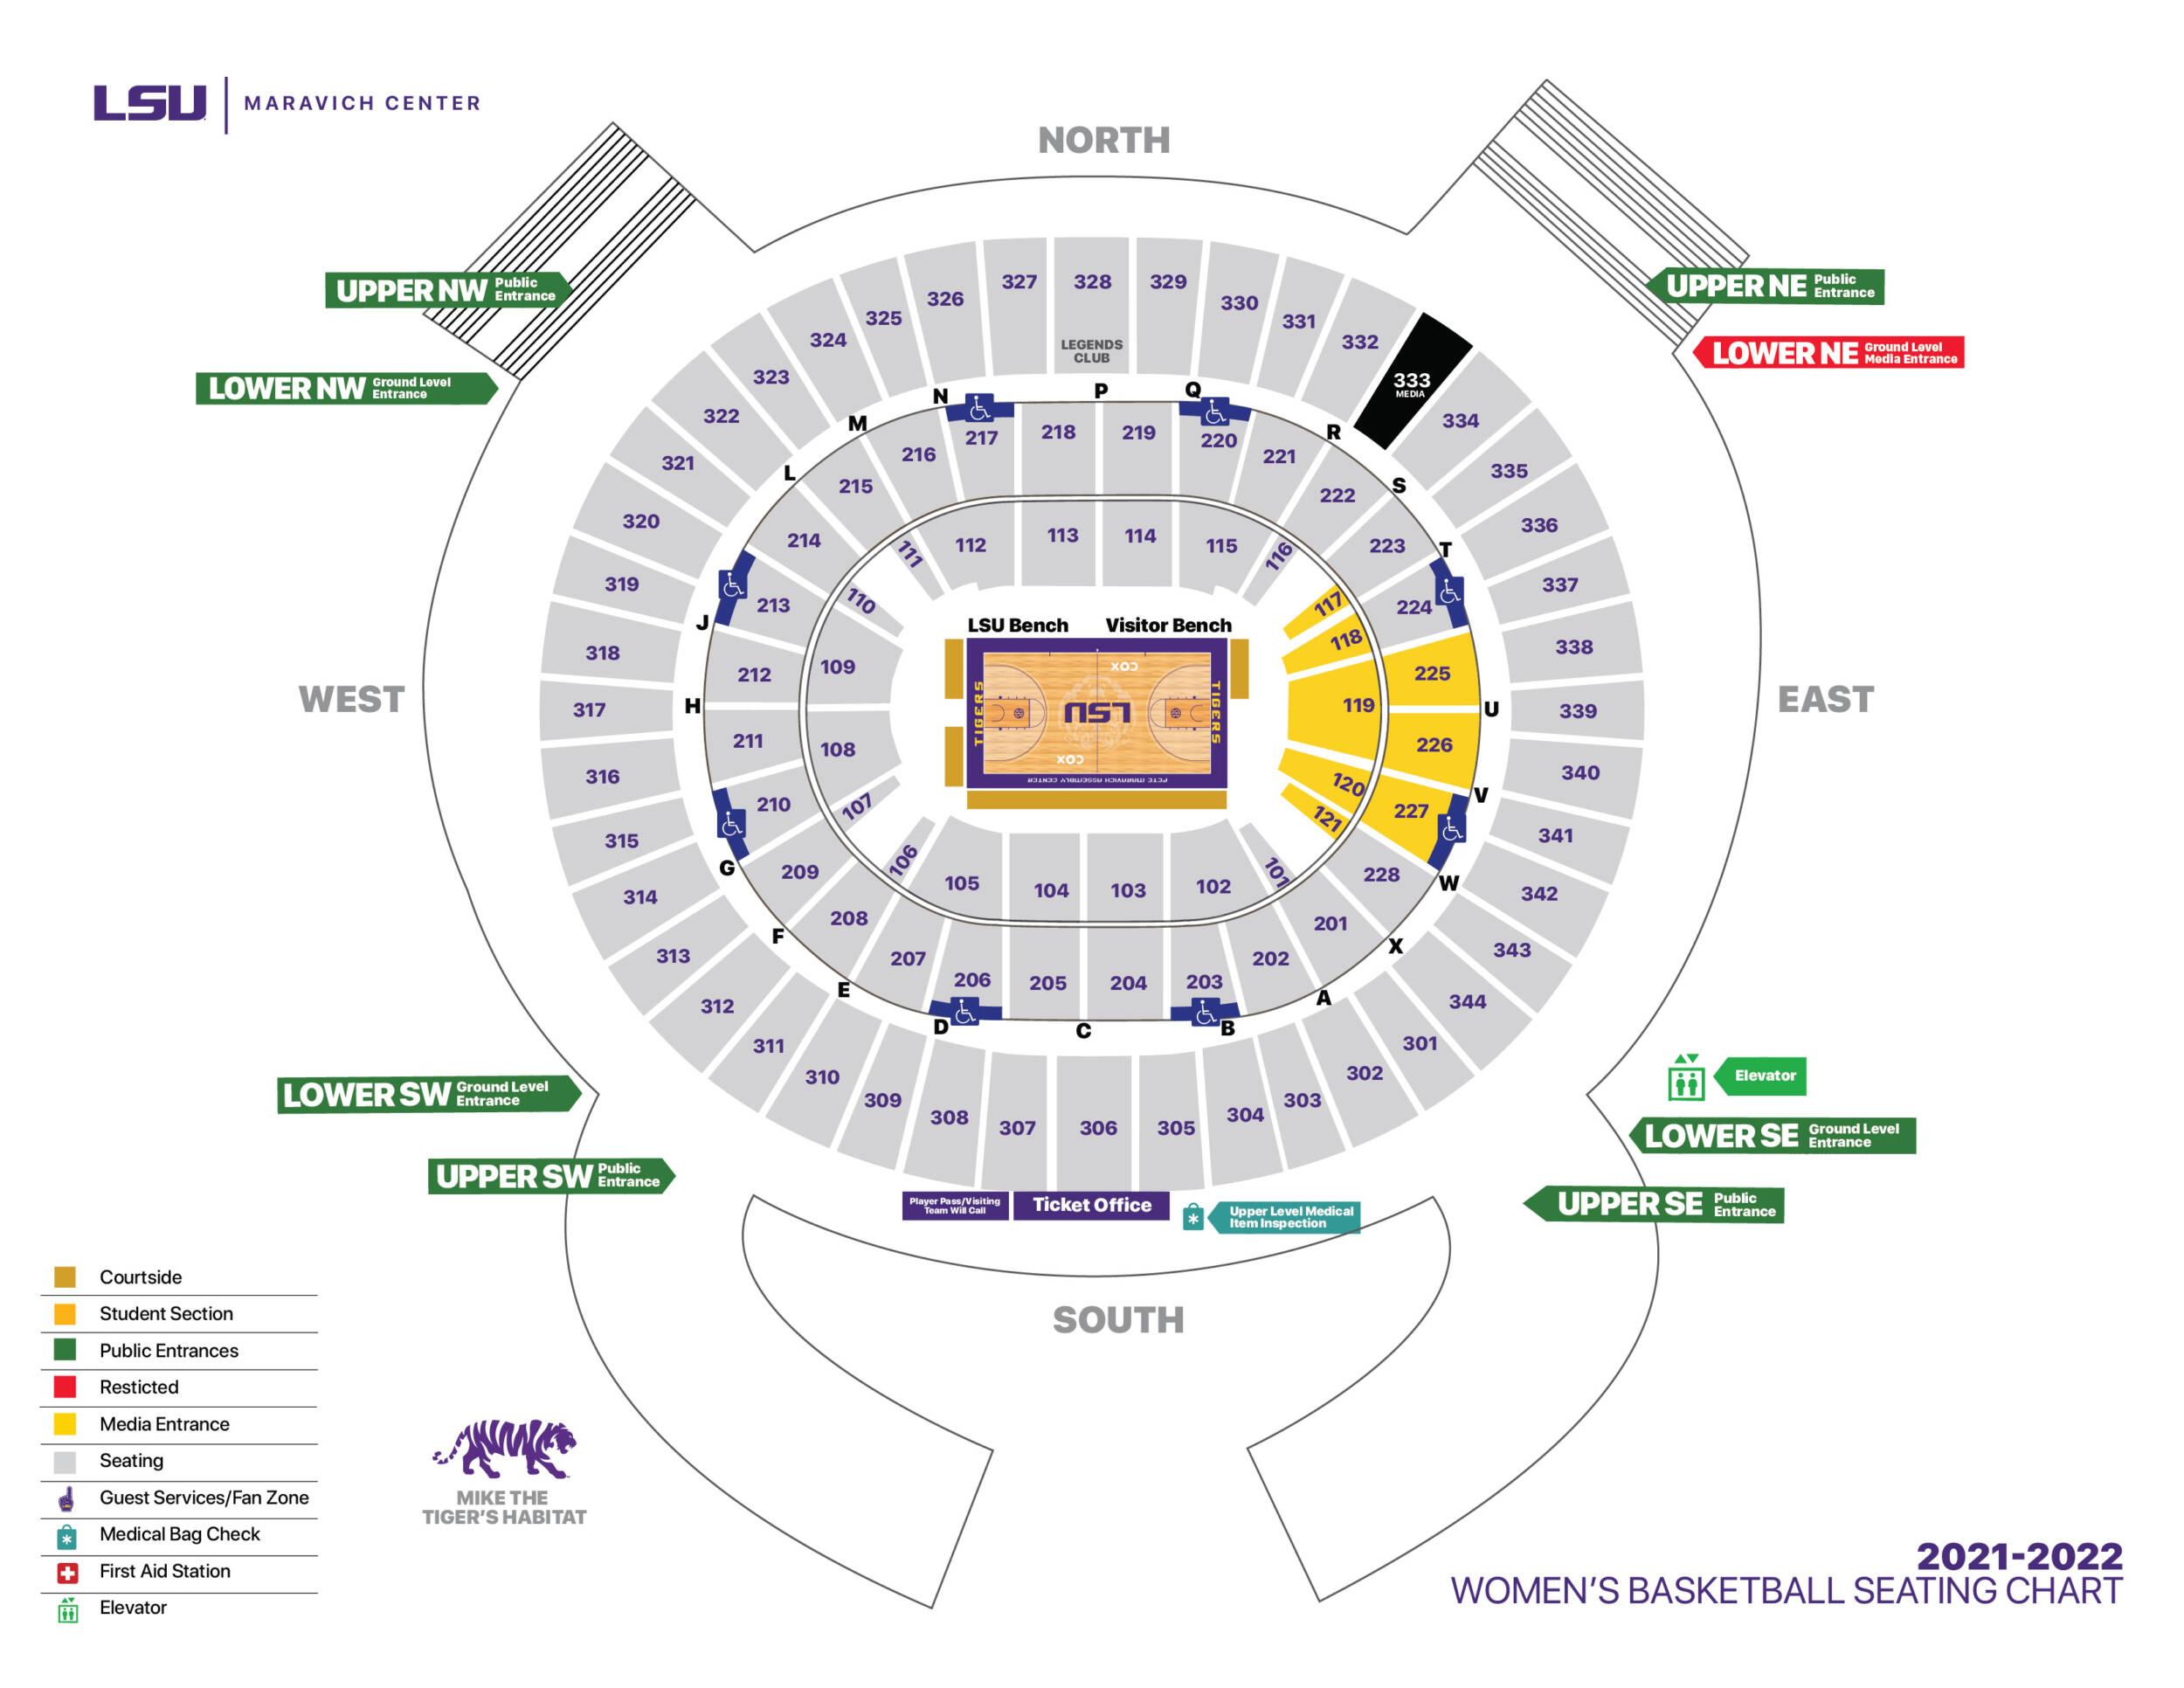 2021-22 LSU Women's Basketball - Maravich Center Seating Chart